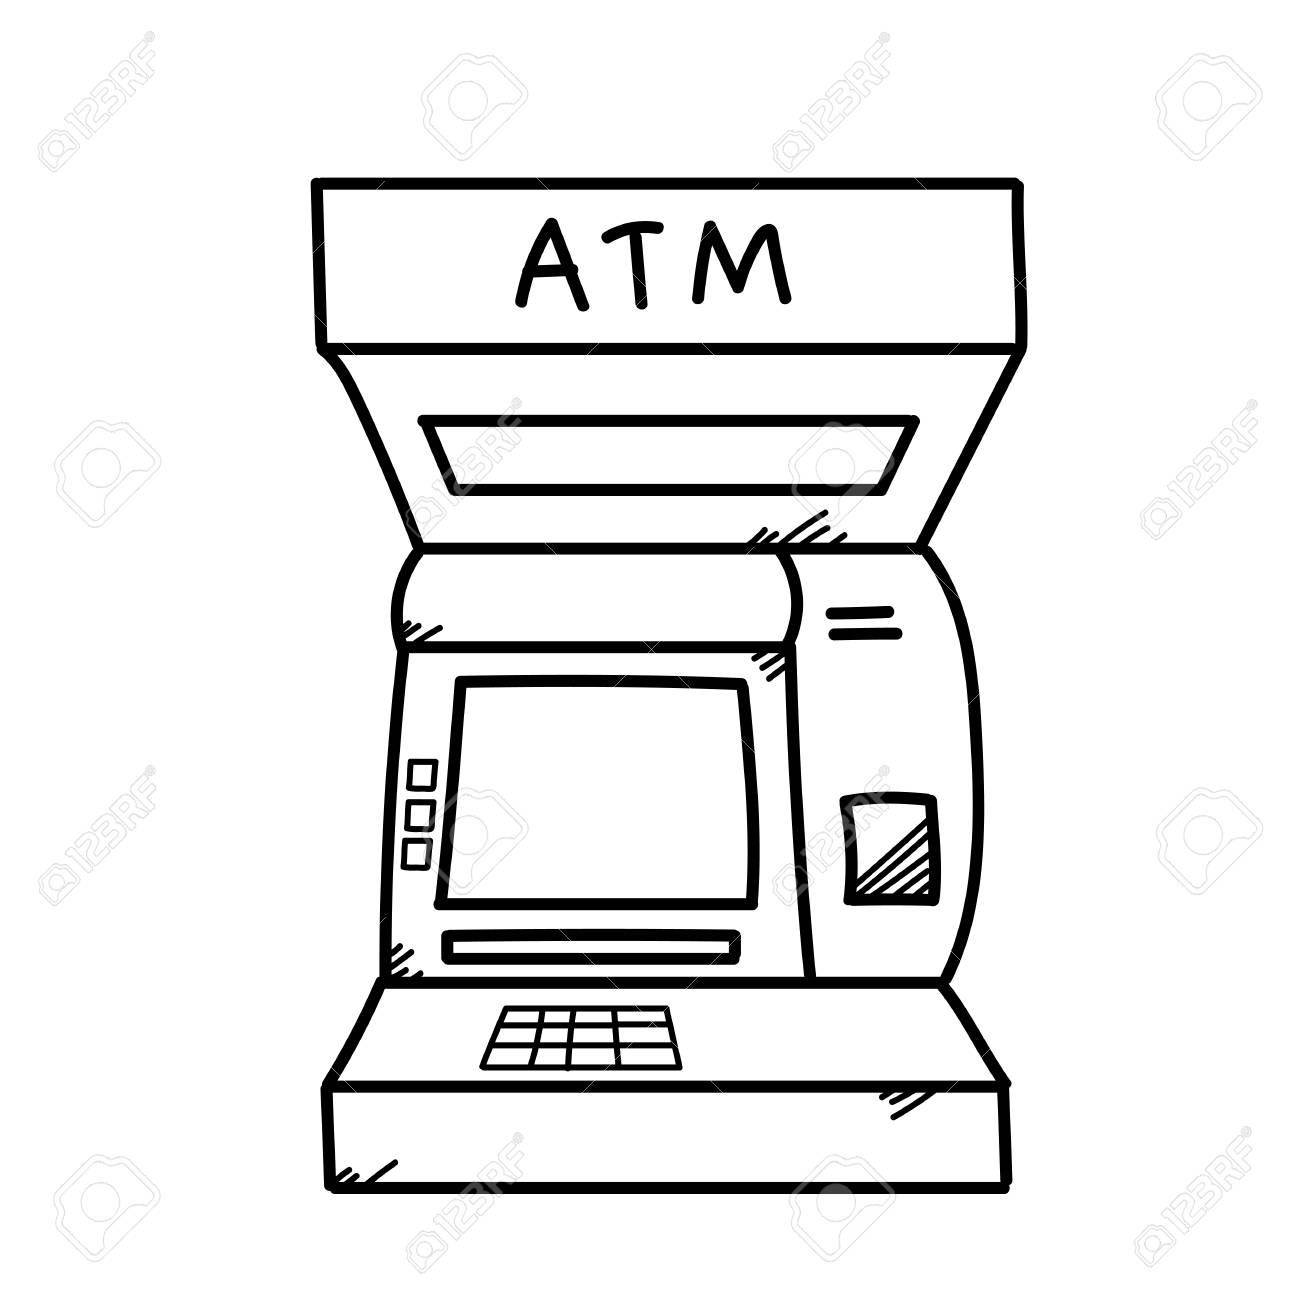 atm India automated teller machine clip art cliparts jpg - Clipartix